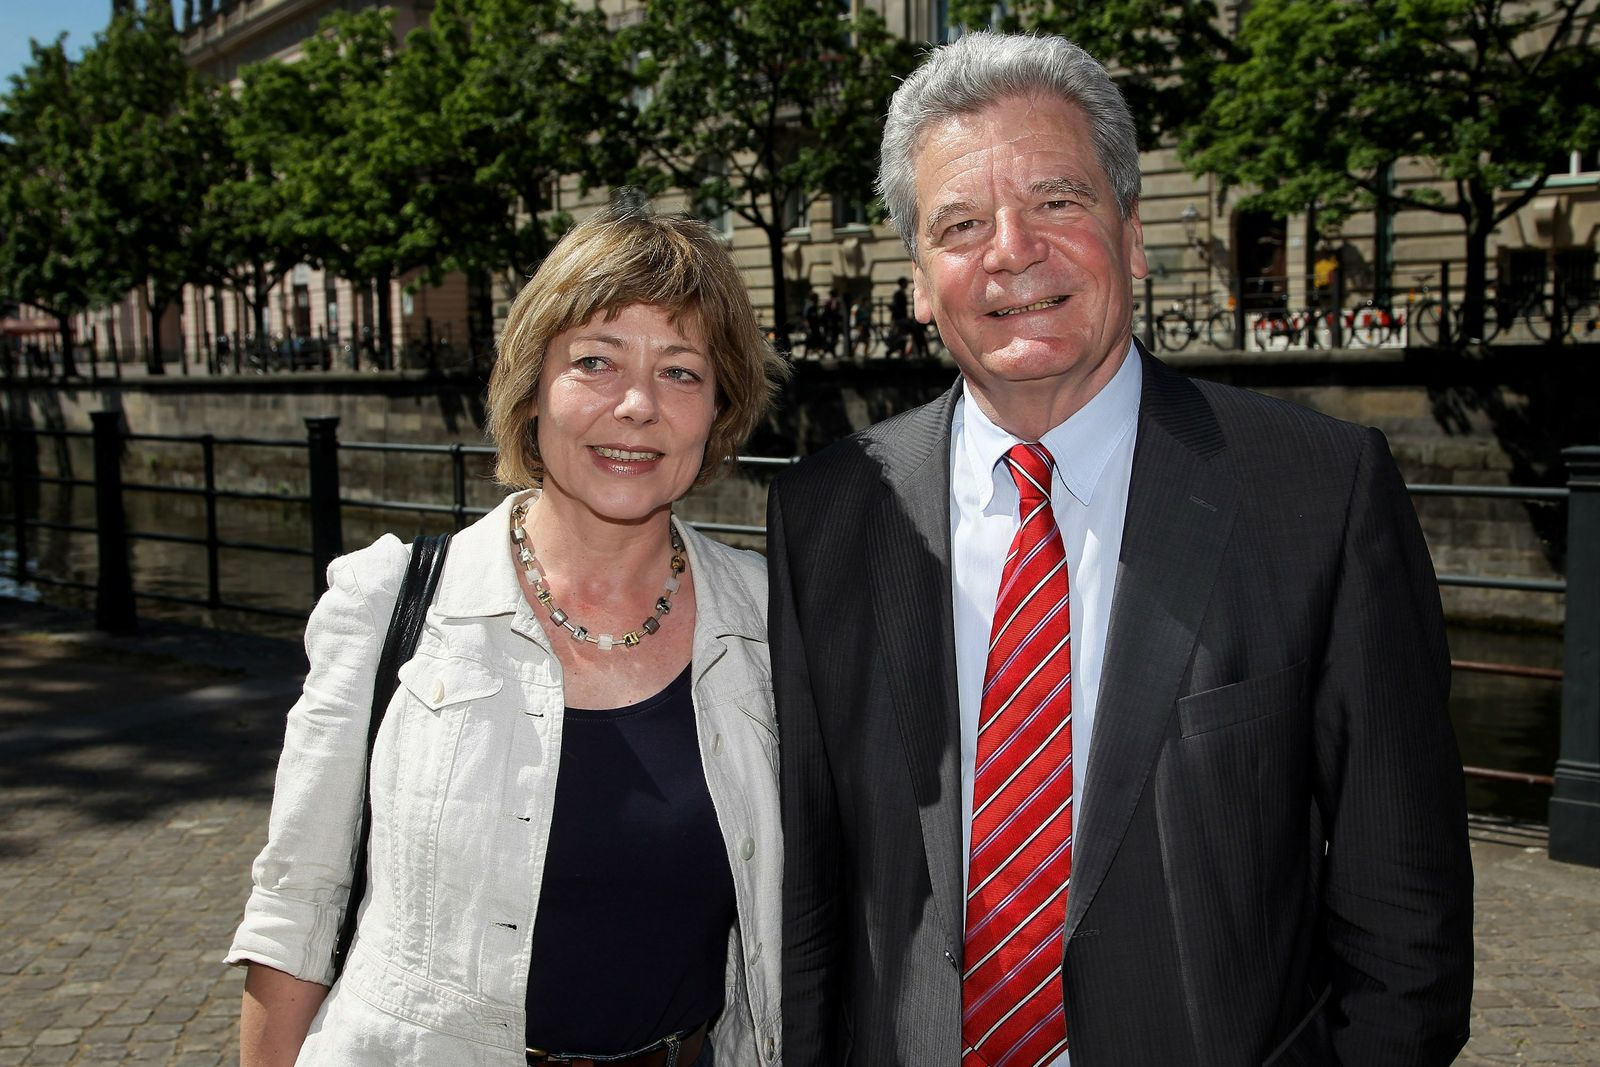 Joachim Gauck / Daniela Schadt